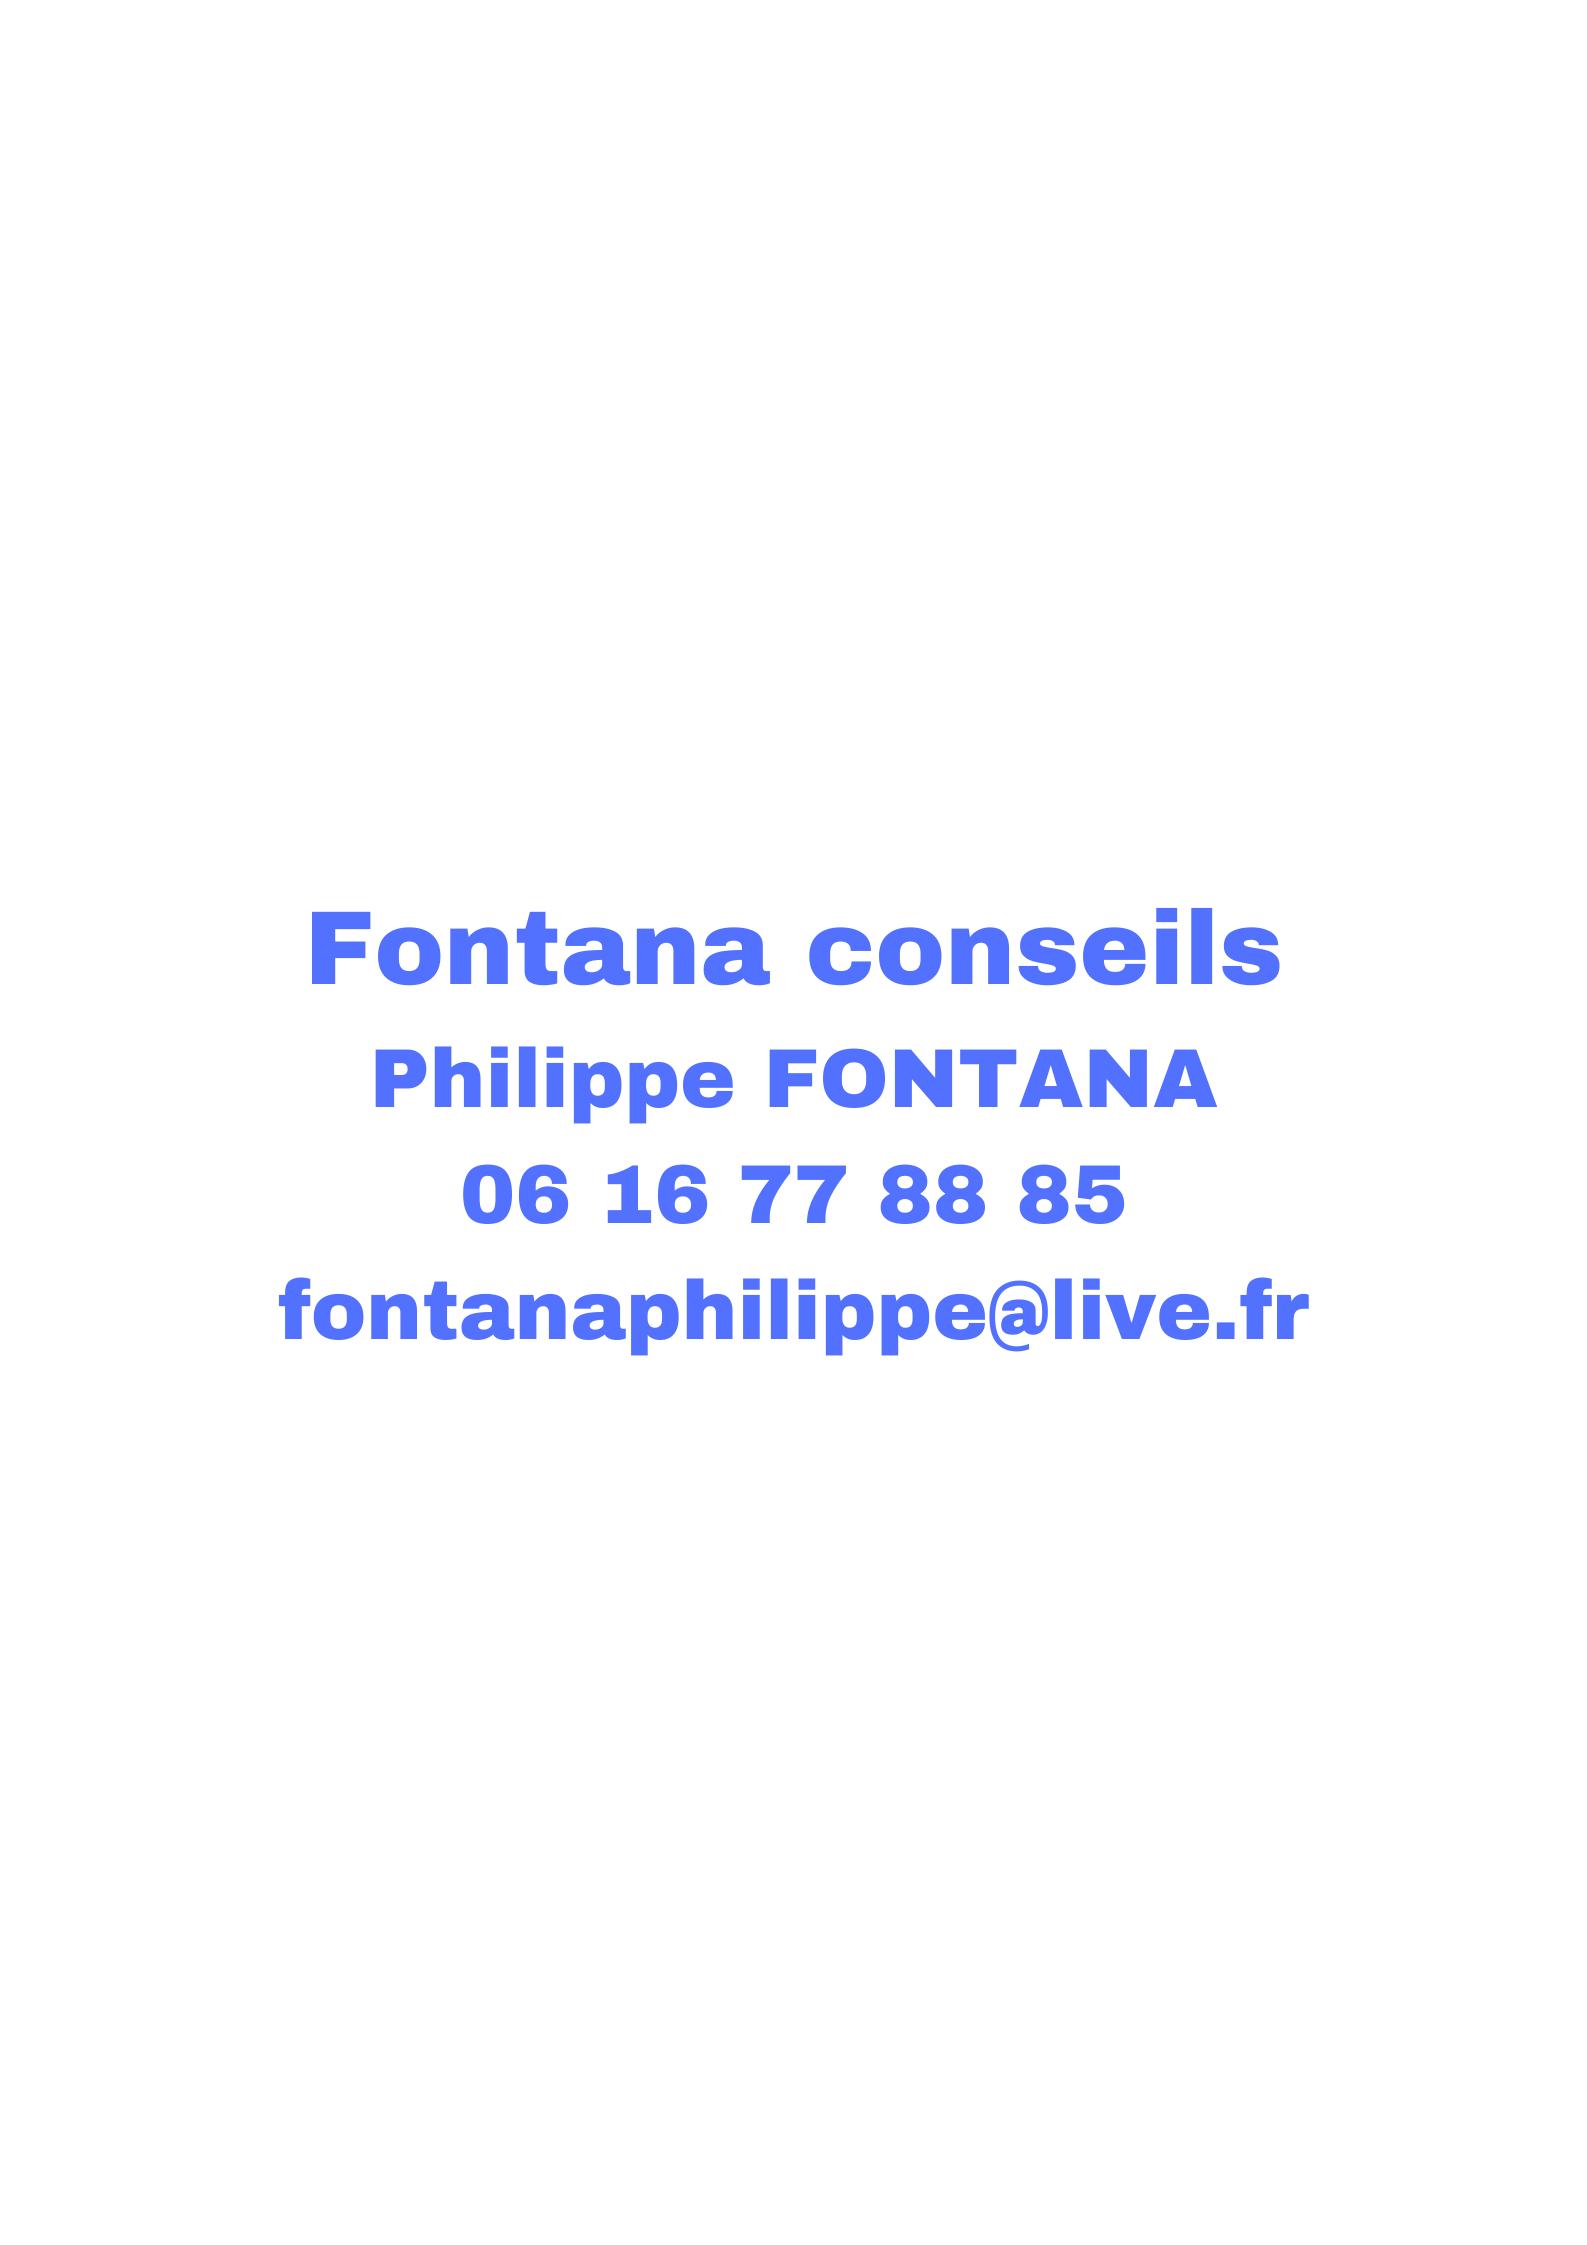 Fontana conseil